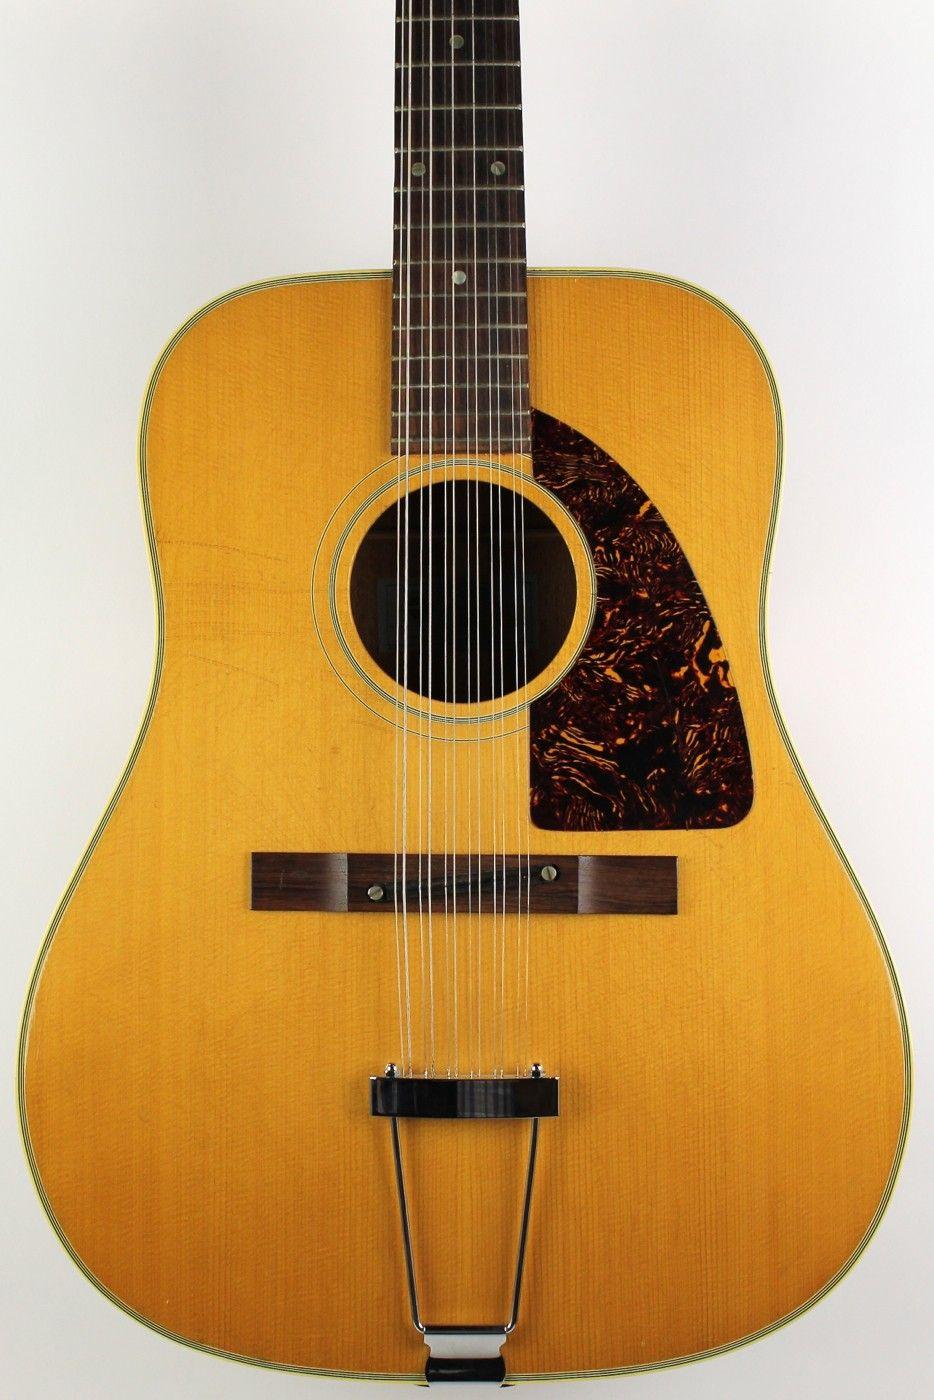 Yamaha Fg 04 Ltd Her Name Is Rosie My Guitar Gear Pinterest